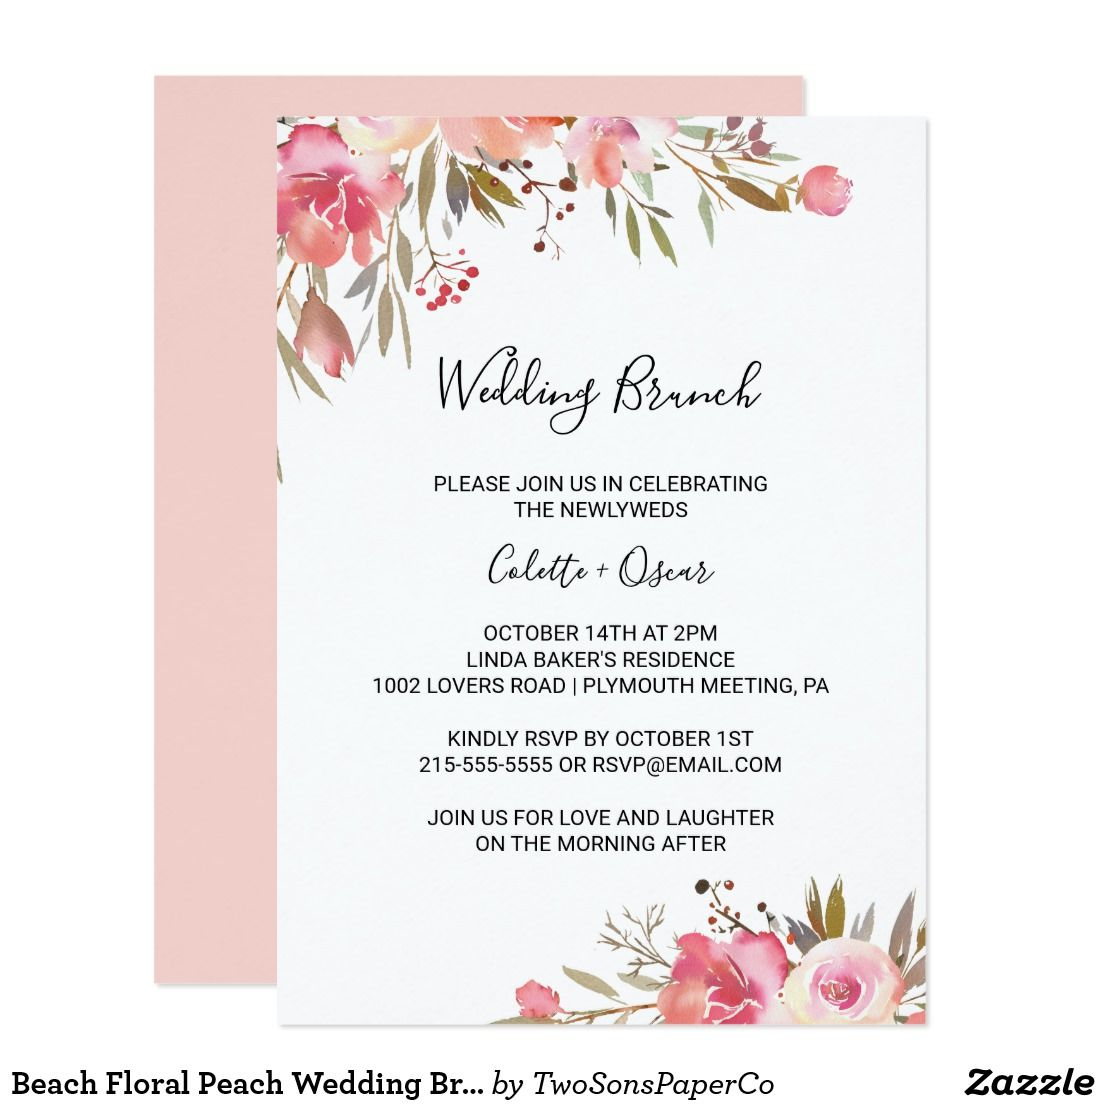 Beach Floral Peach Wedding Brunch Invitation Wedding Brunch Invitations Brunch Wedding Wedding Invitations